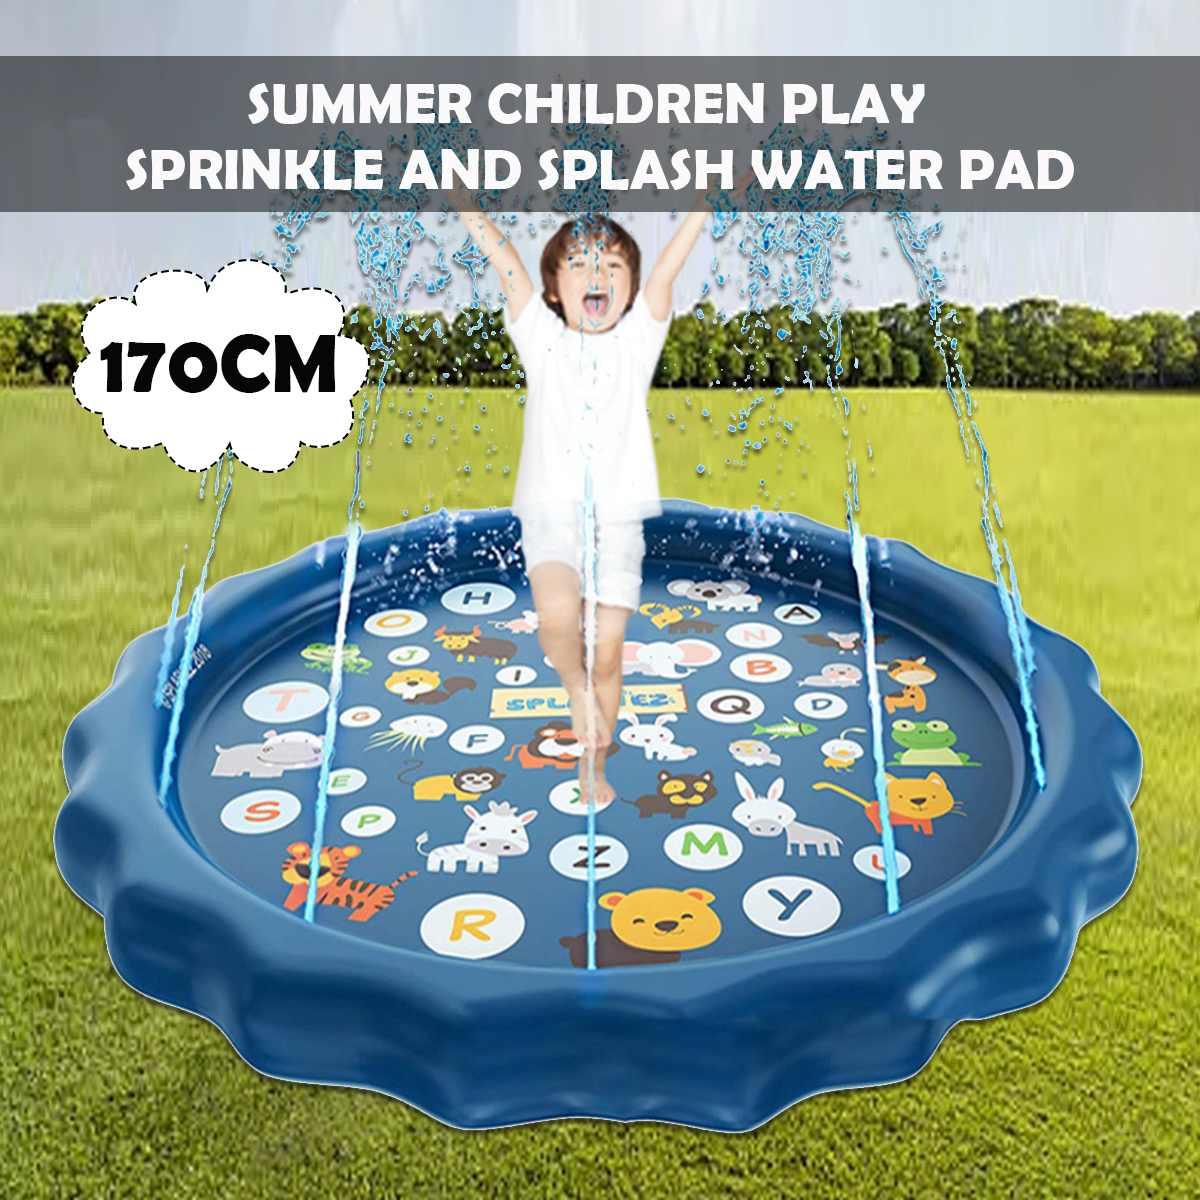 170cm Sprinkle Splash Play Mat Fun Summer Spray ToysInflatable Splash Pad Outdoor Water Toys For Children Kids Toddlers